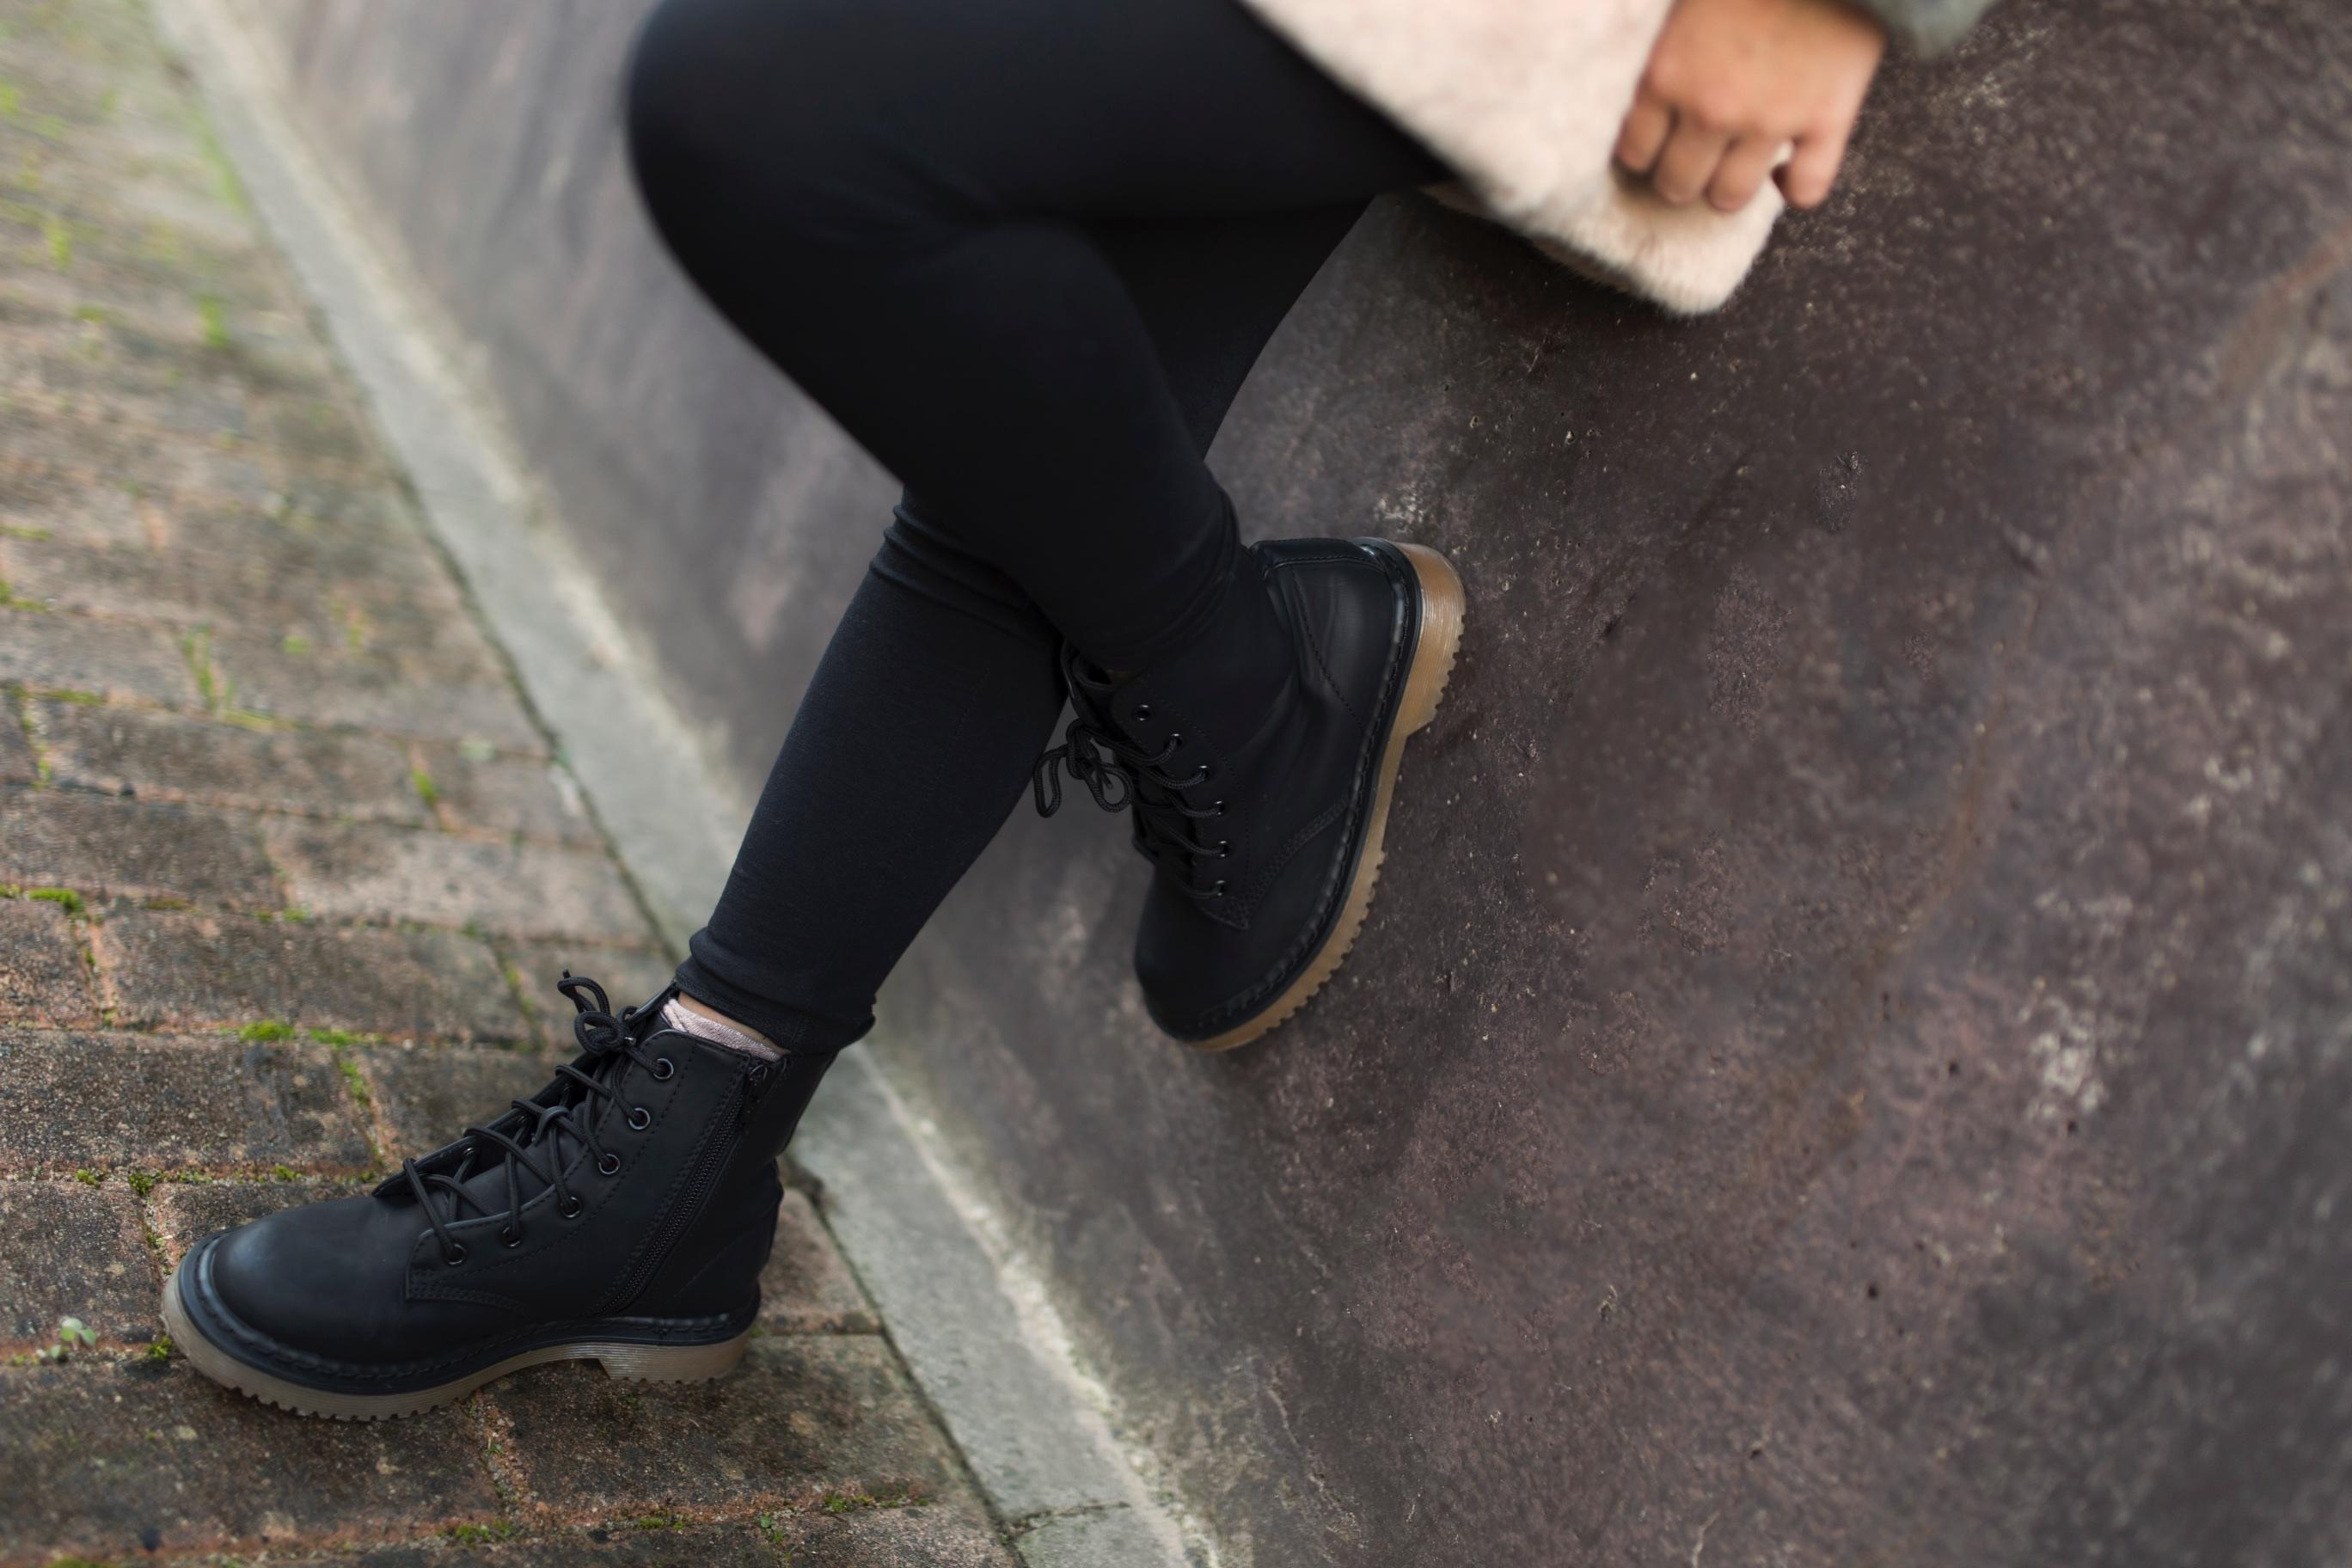 Jimena -style- Primark boots-niños-moda-coruña-look-fashion girl-zara kids-descalzaporelparque